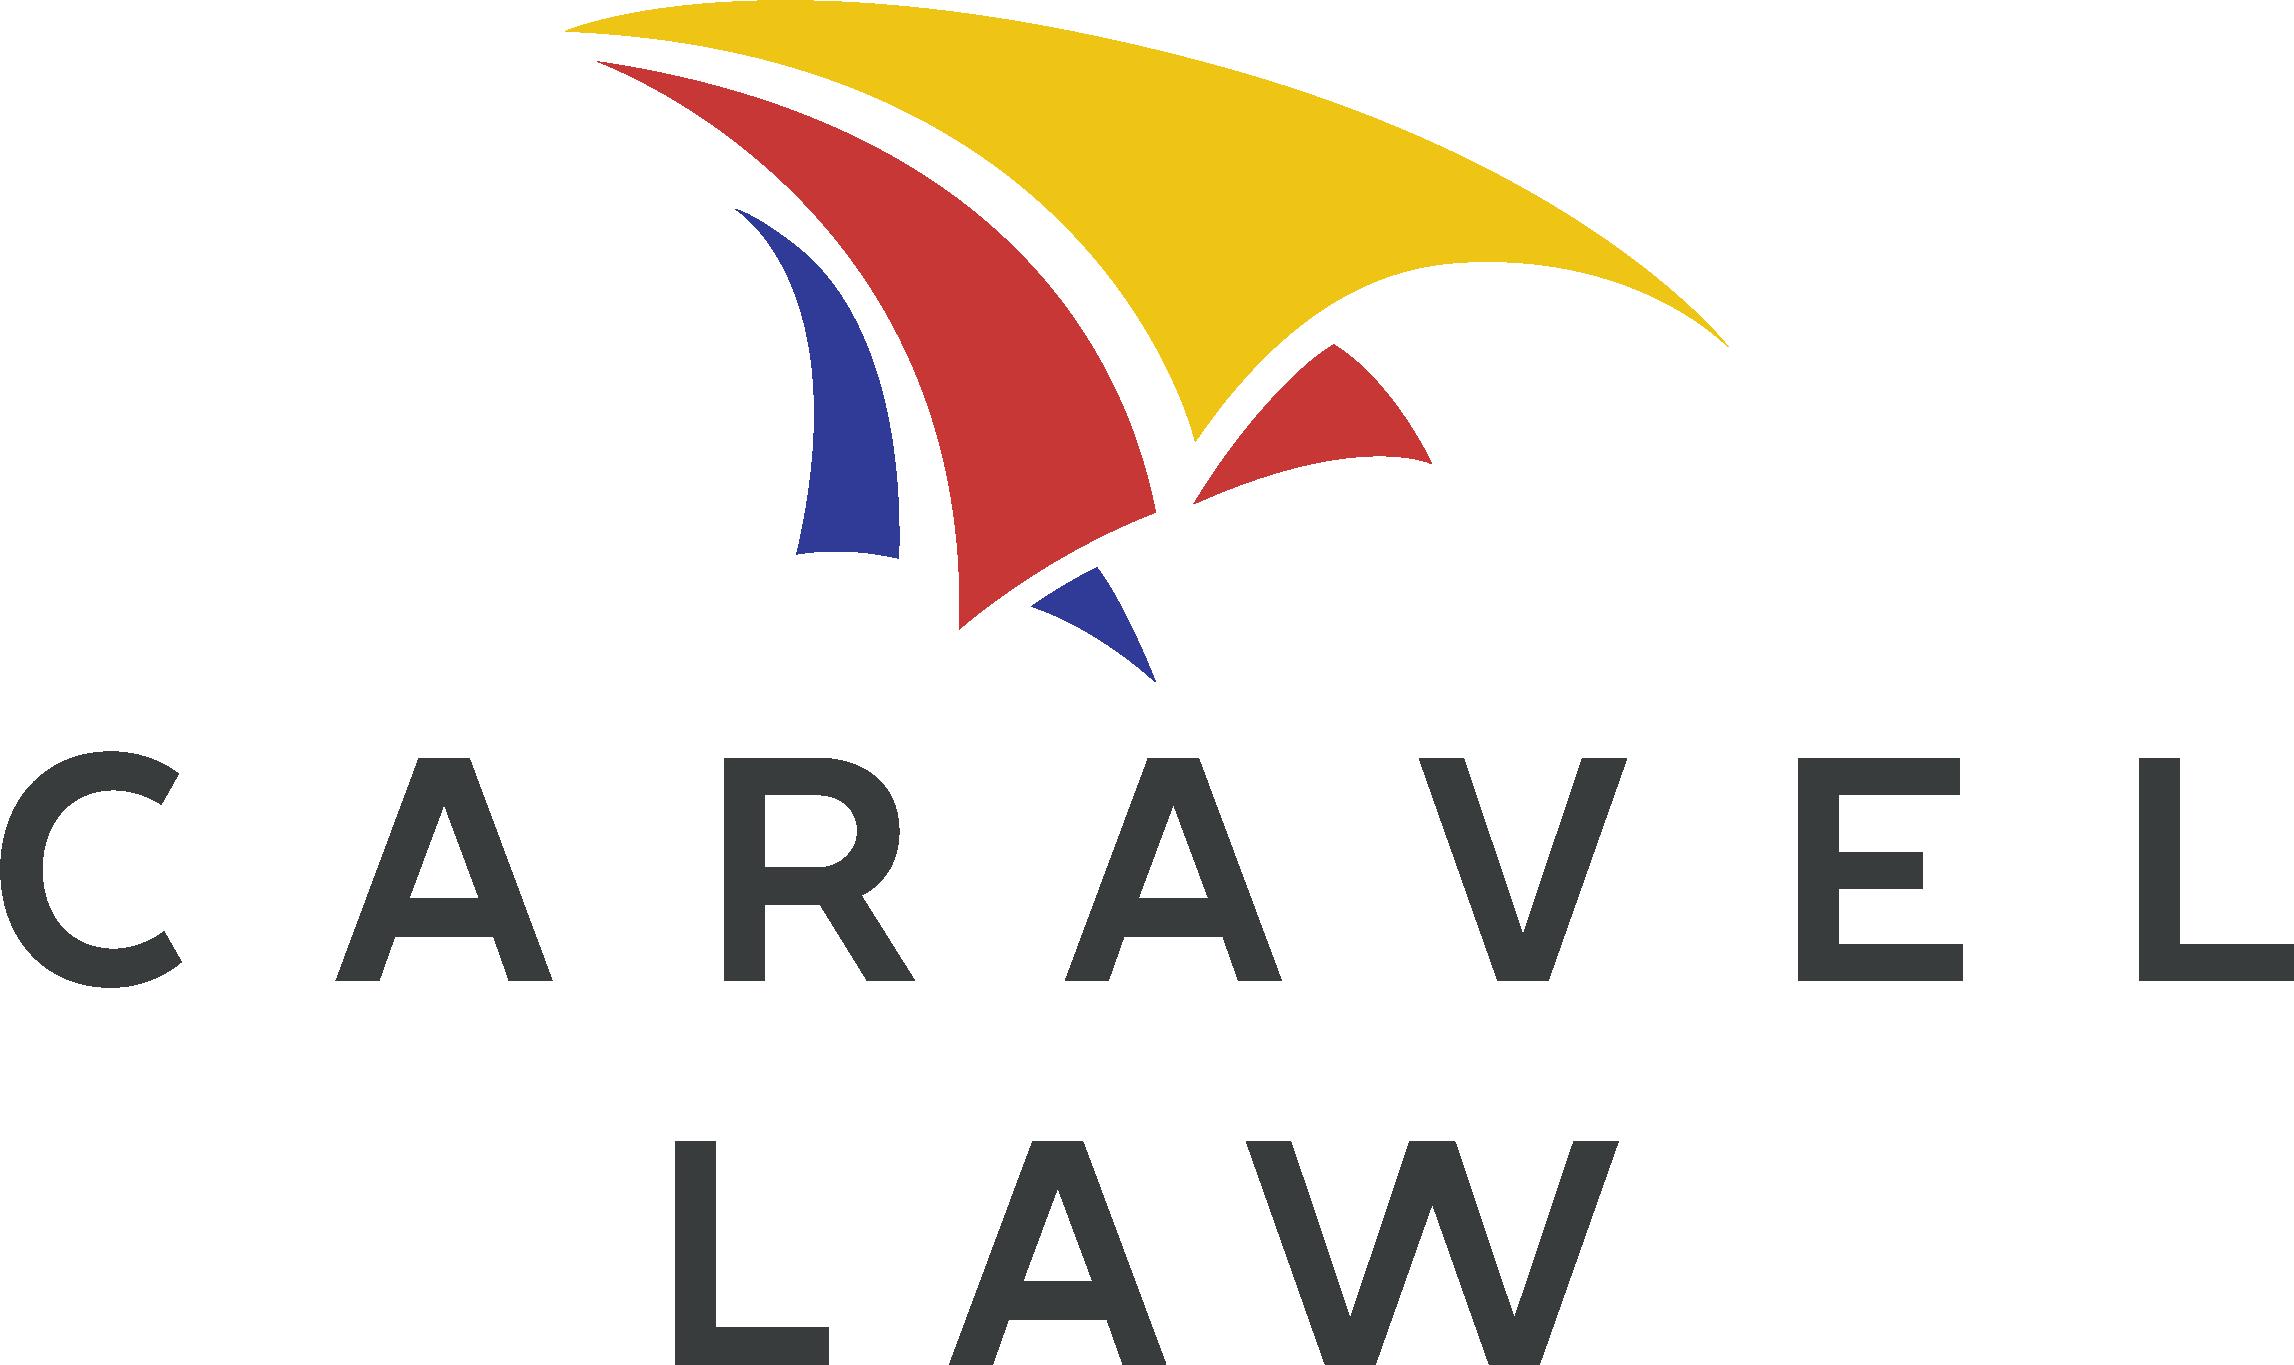 Caravel Law